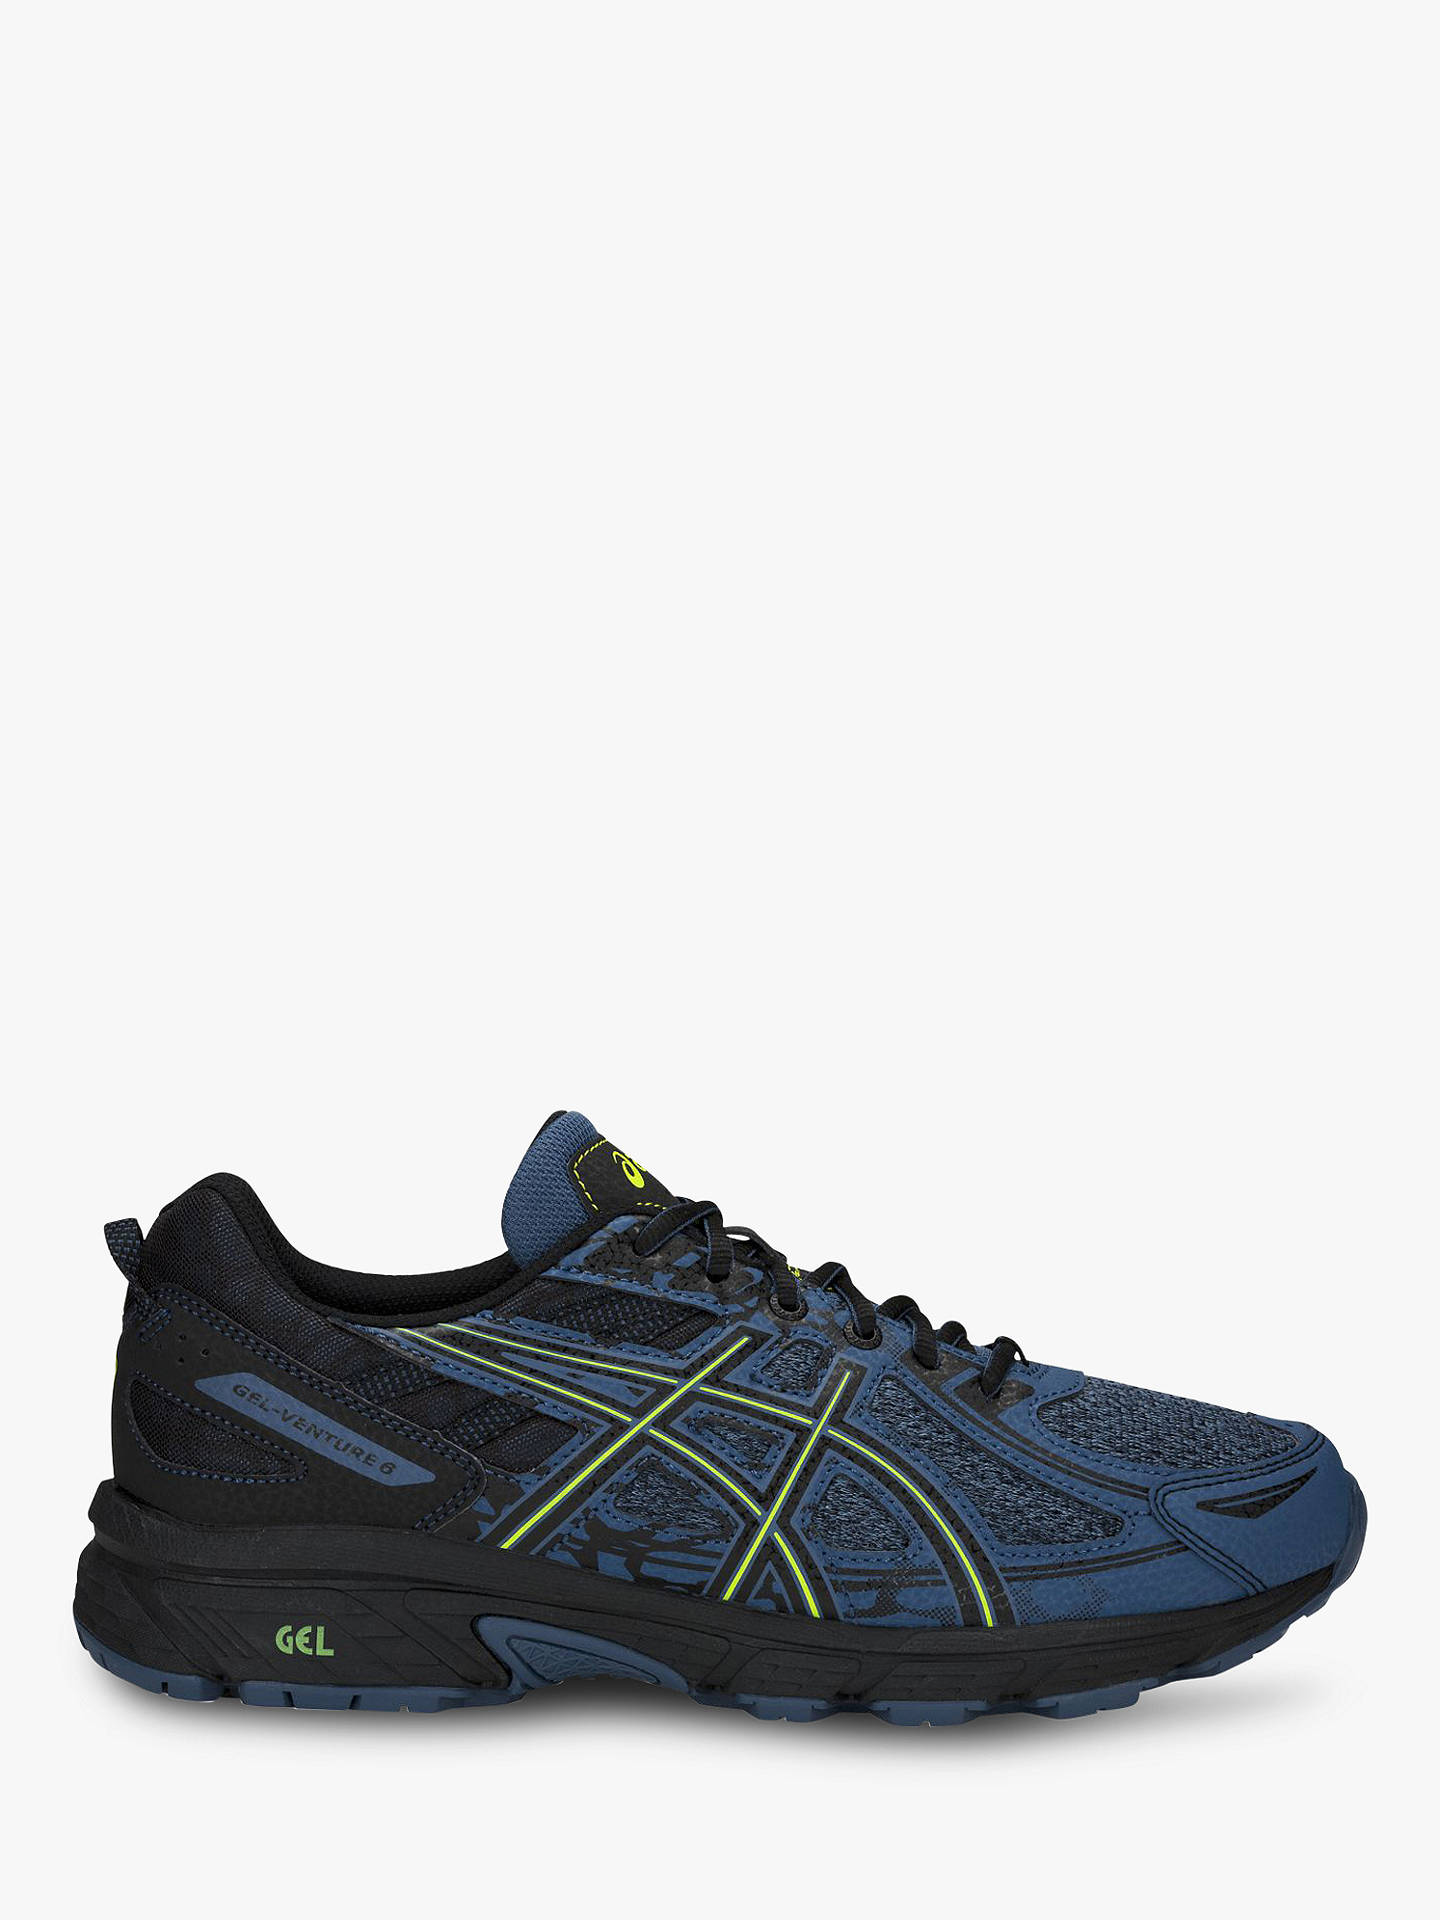 604e153a067 BuyASICS GEL-VENTURE 6 Men s Running Shoes